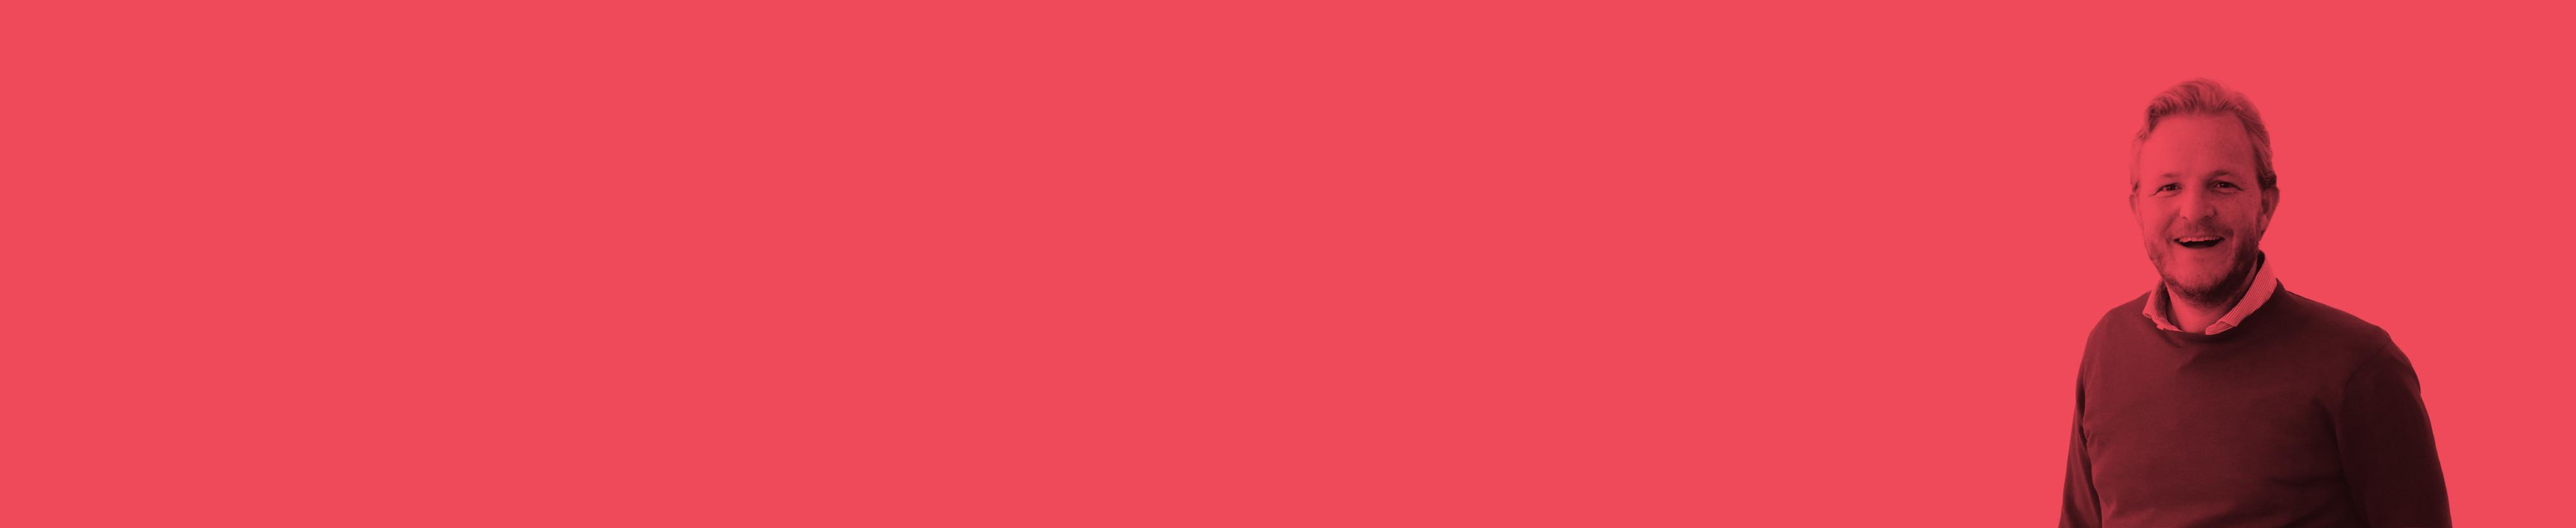 dlc-constantin-leuschner-farbe-1